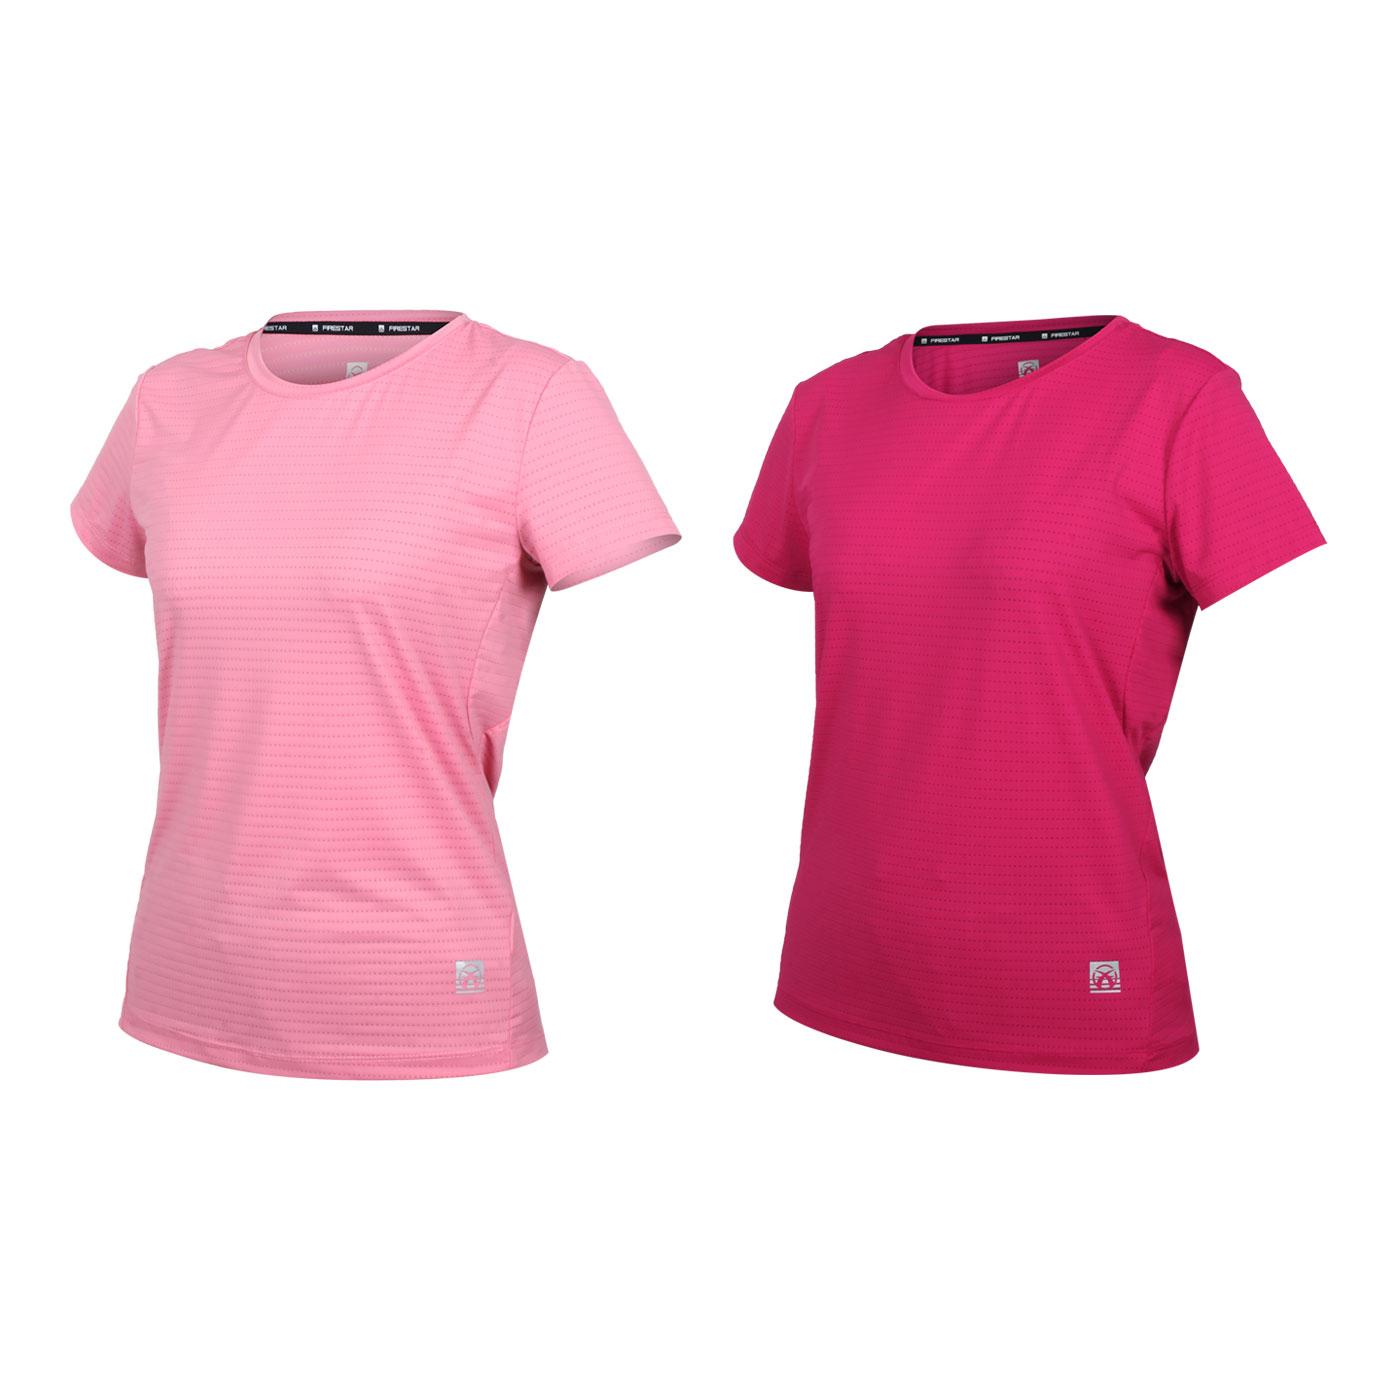 FIRESTAR 女款彈性機能圓領短袖T恤 DL162-43